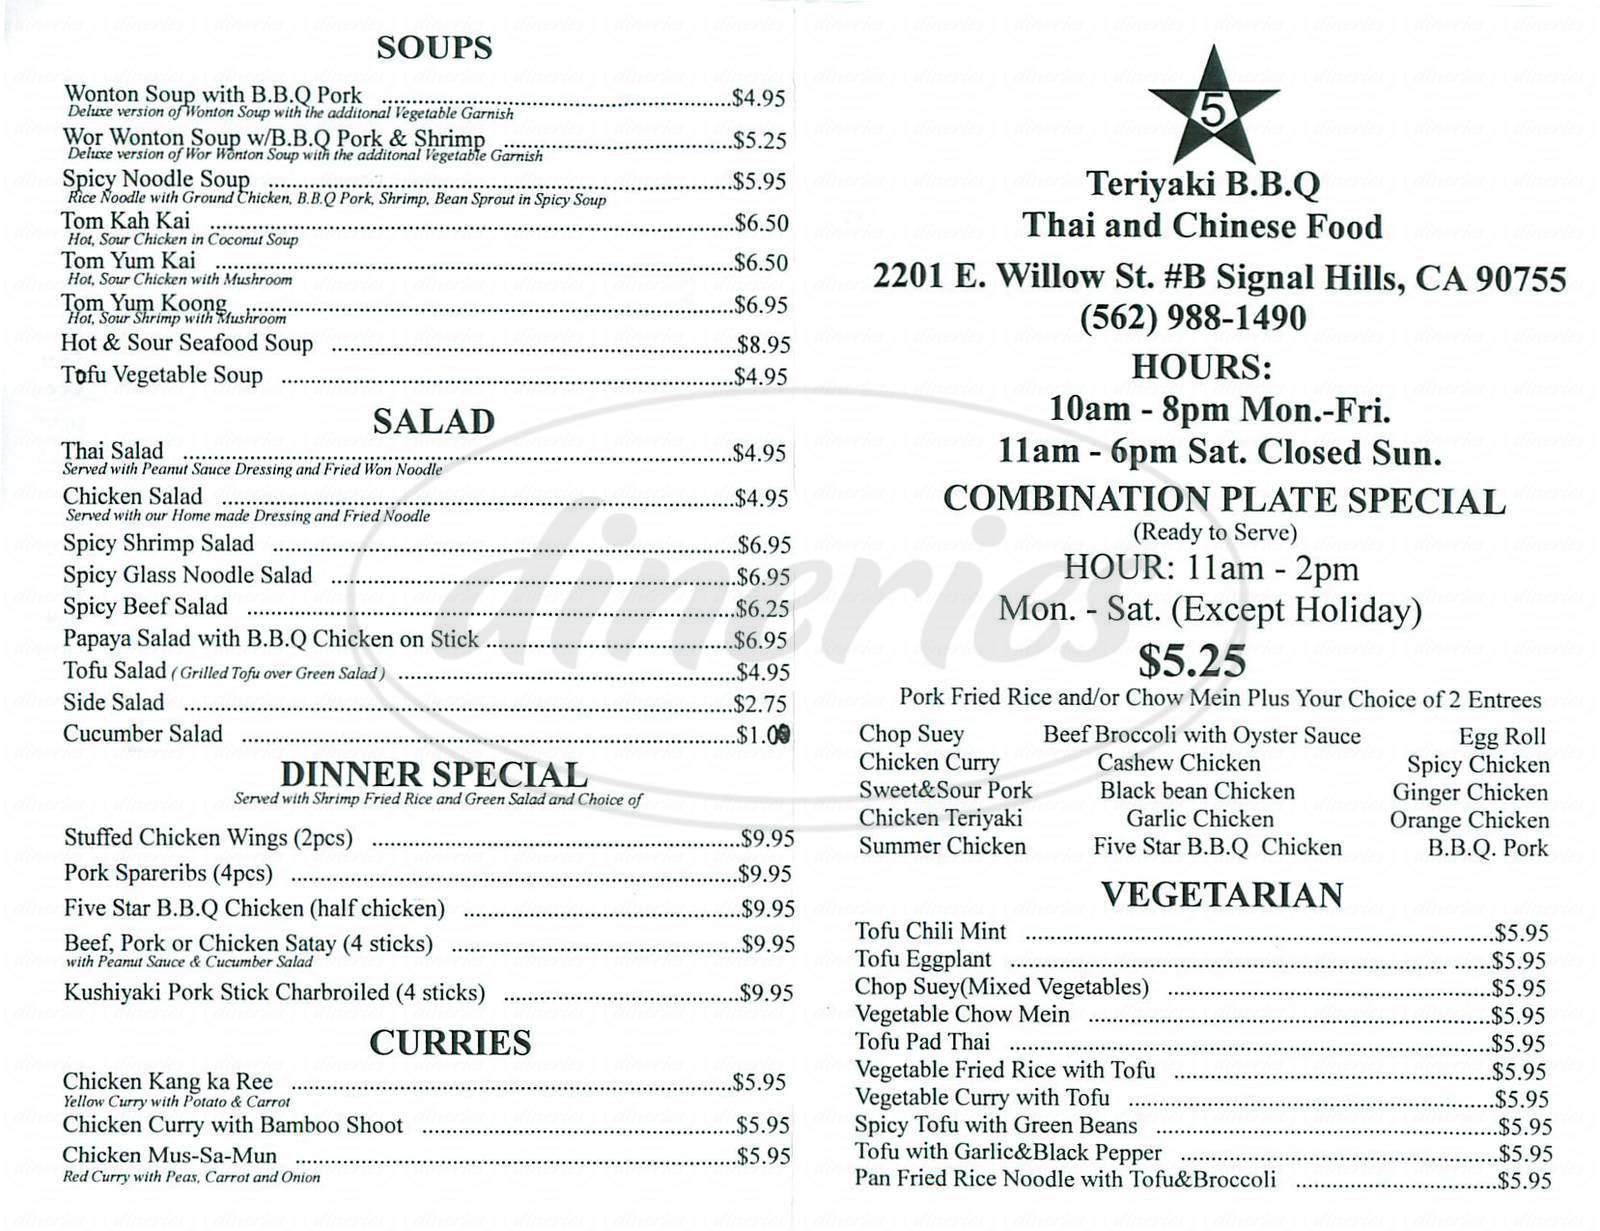 menu for 5 Star Teriyaki BBQ